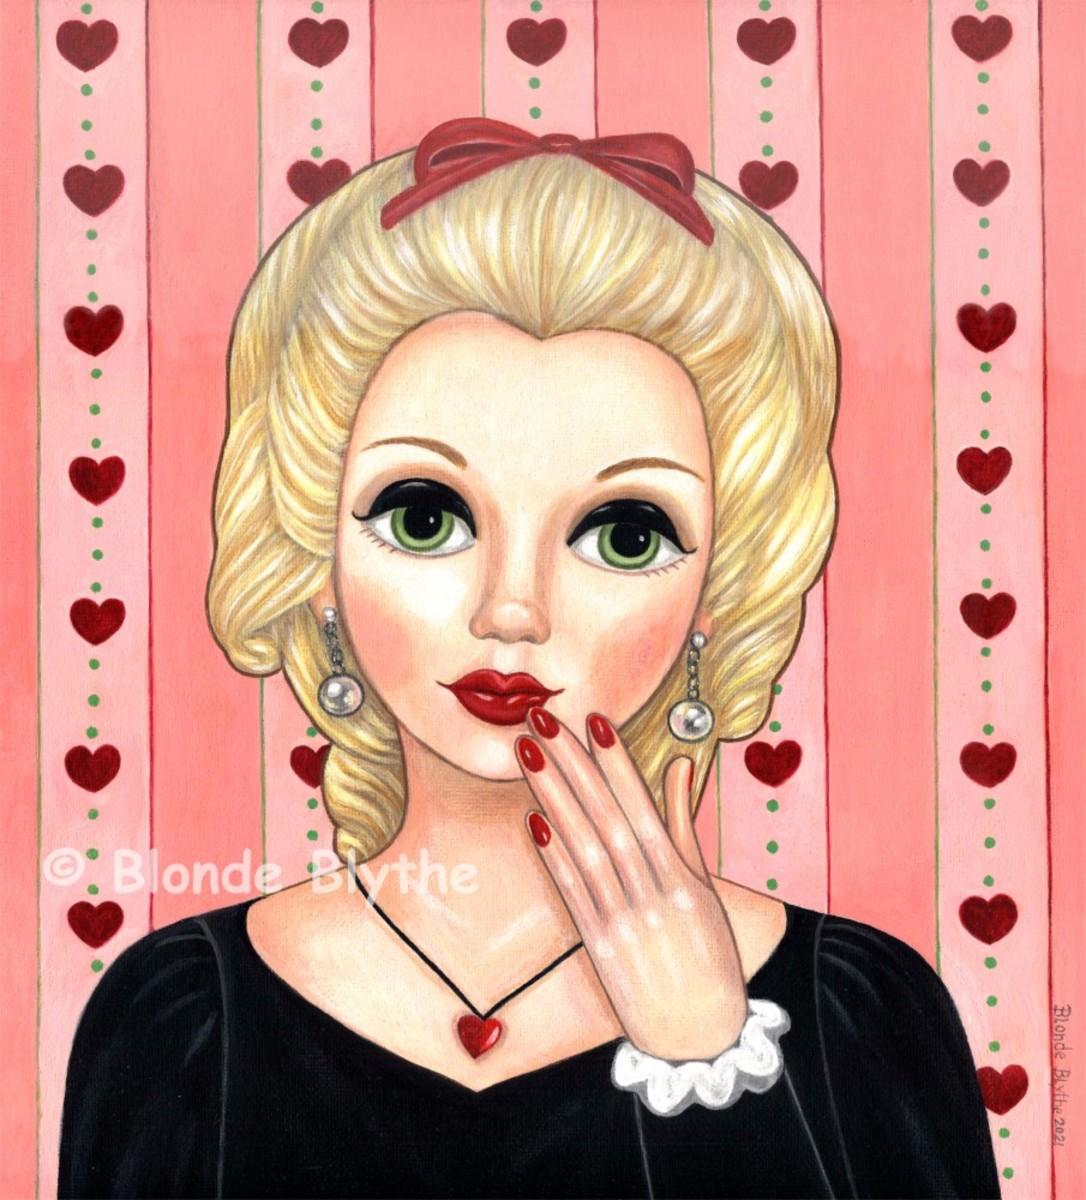 blondeblythe